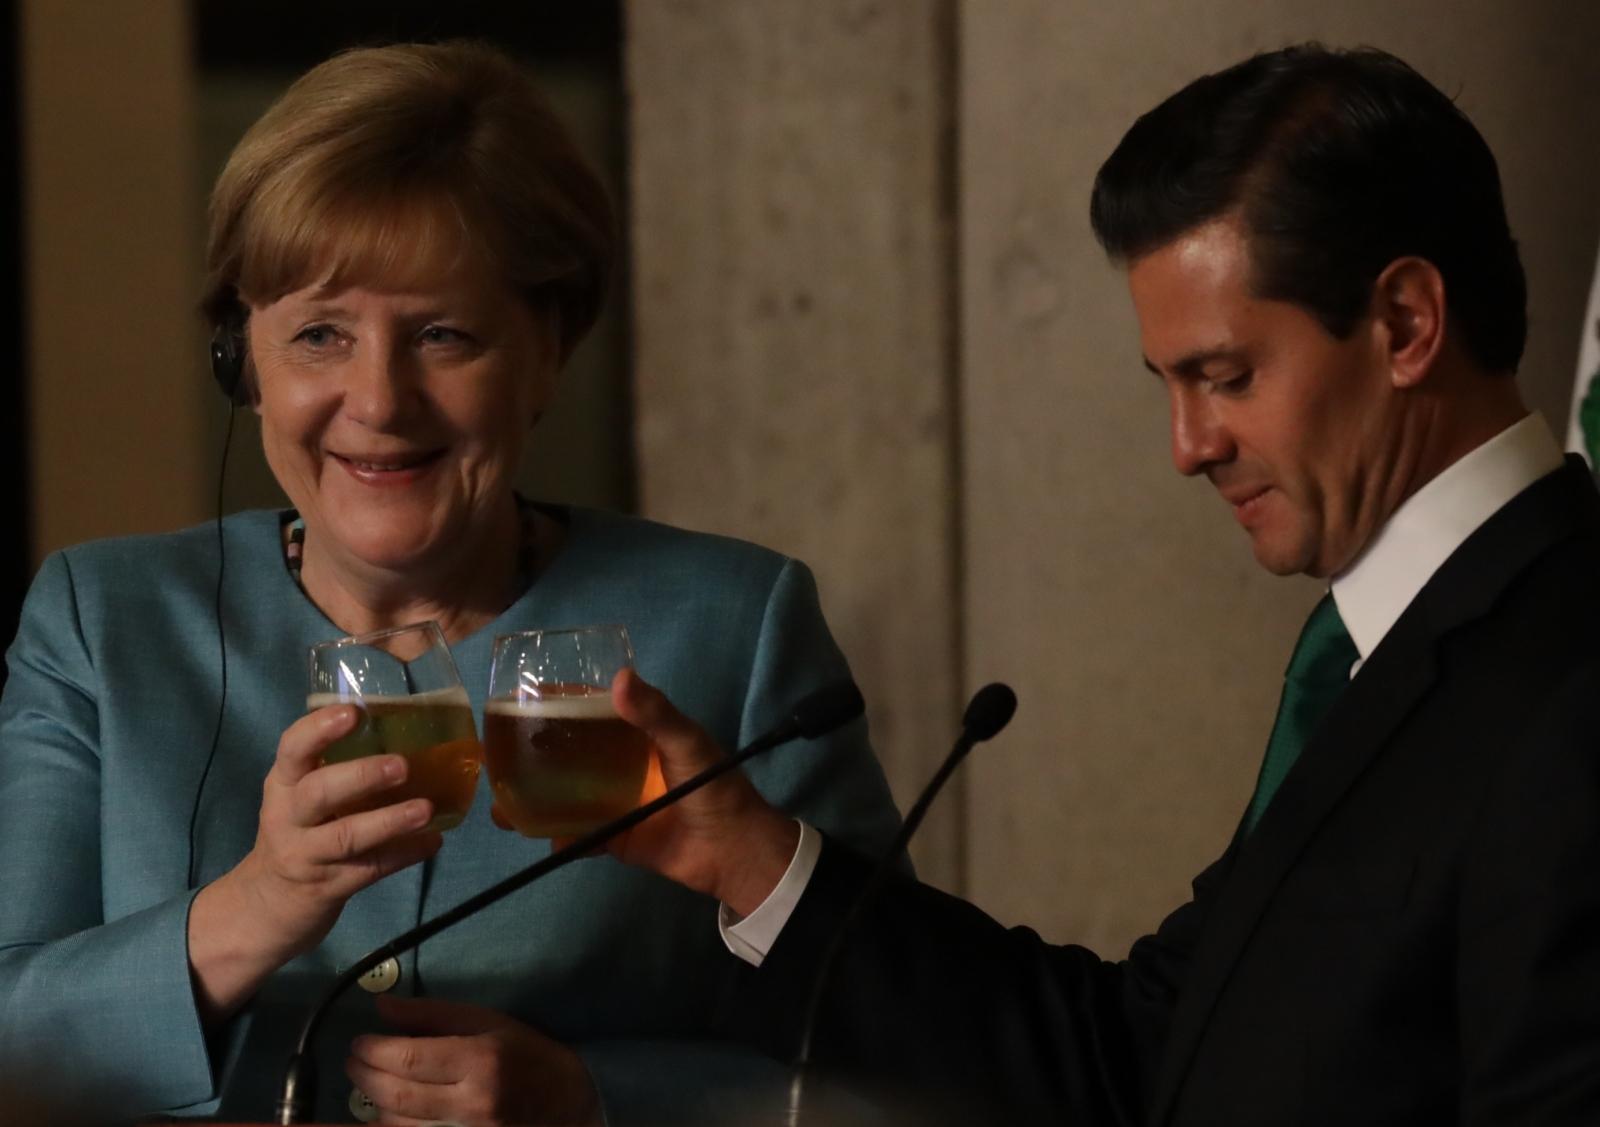 German Chancellor Angela Merkel  toasts